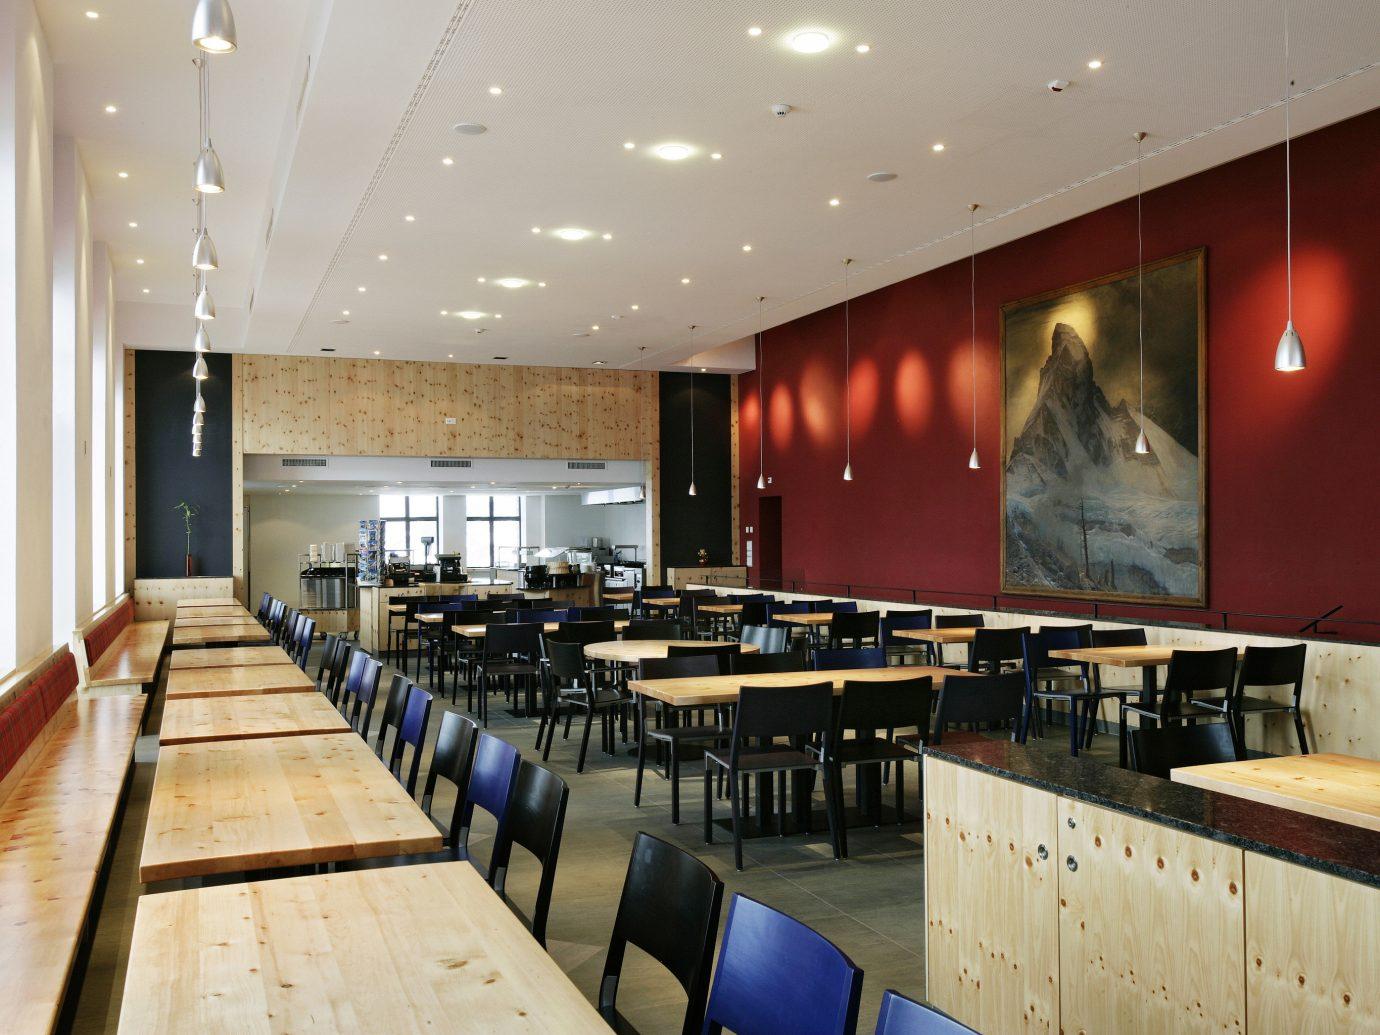 Hotels Offbeat indoor ceiling floor interior design restaurant conference hall table auditorium wood long furniture several dining room